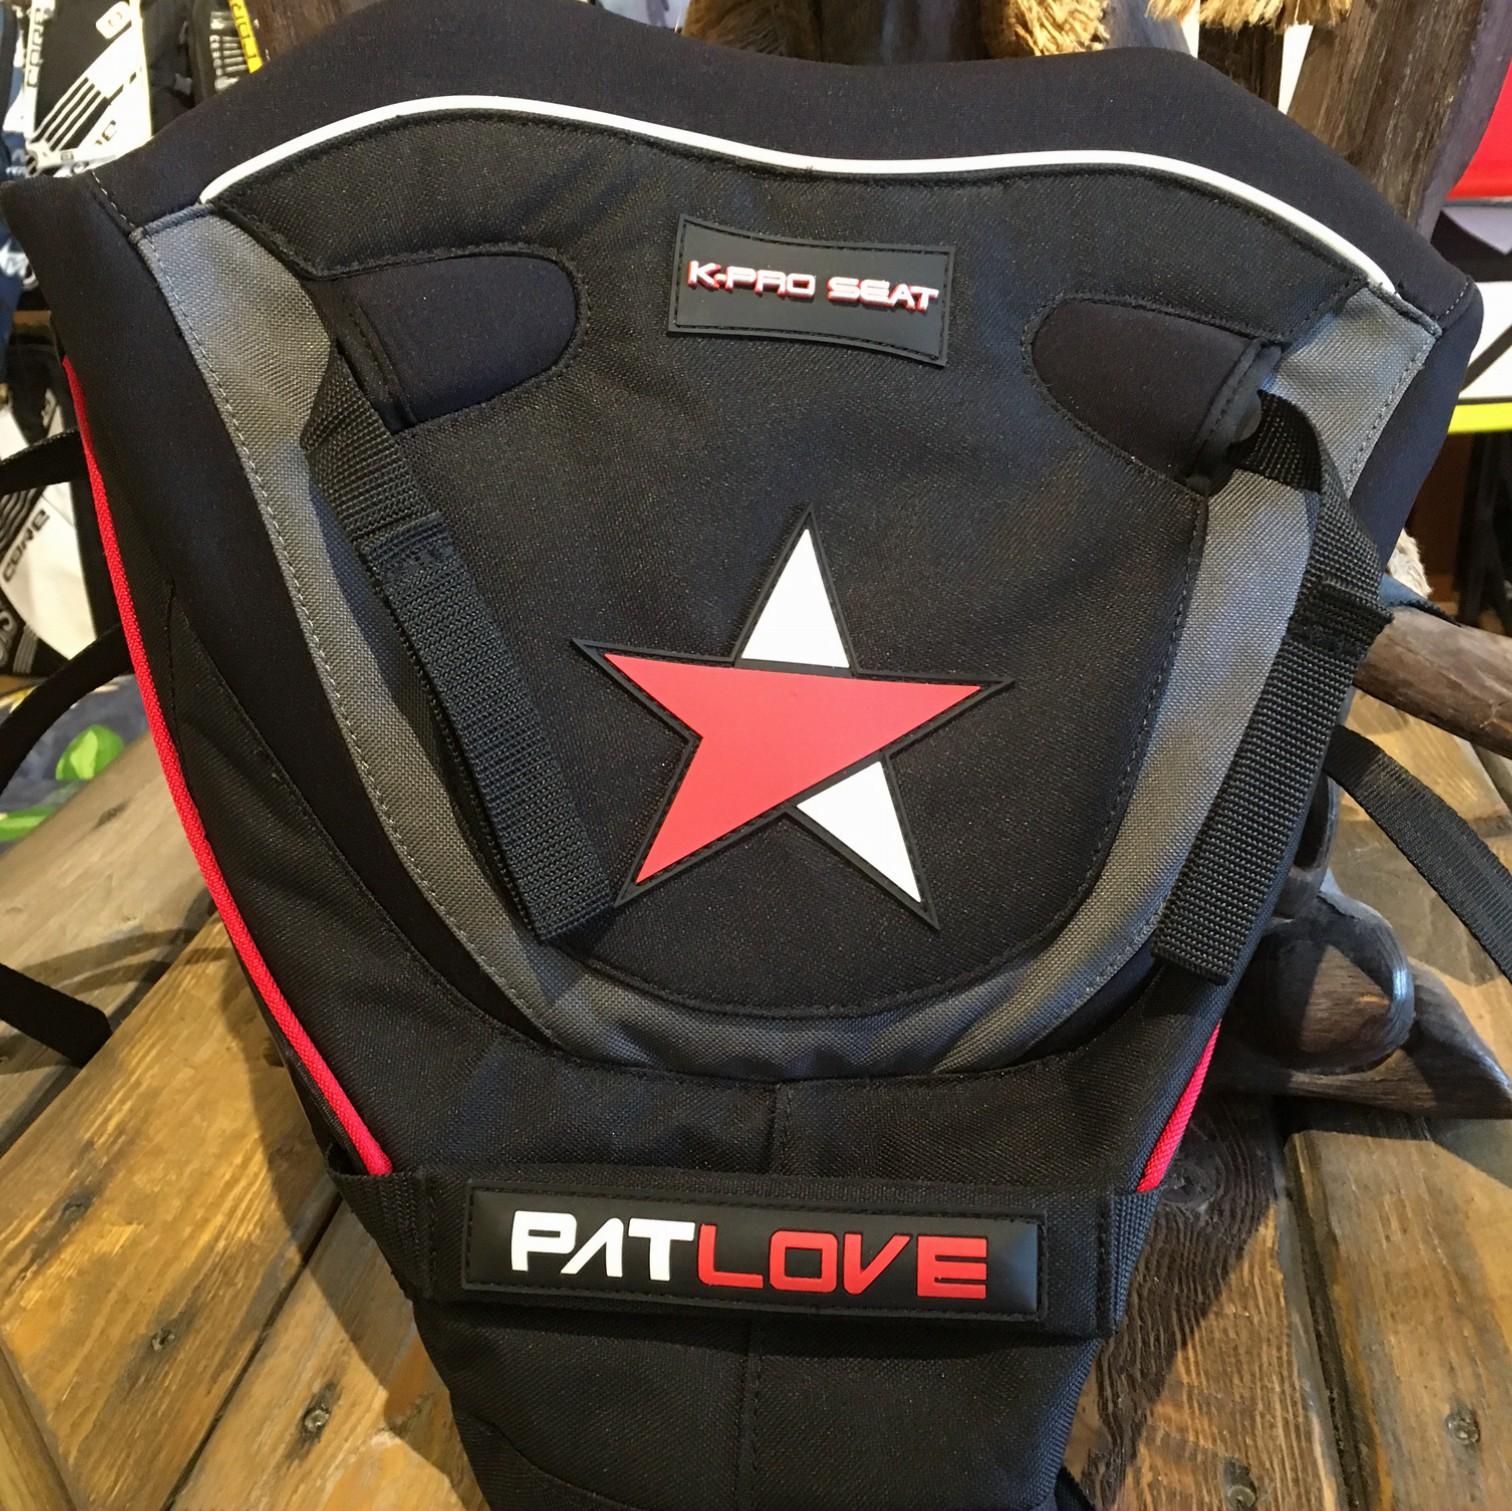 Pat Love K Pro Seat